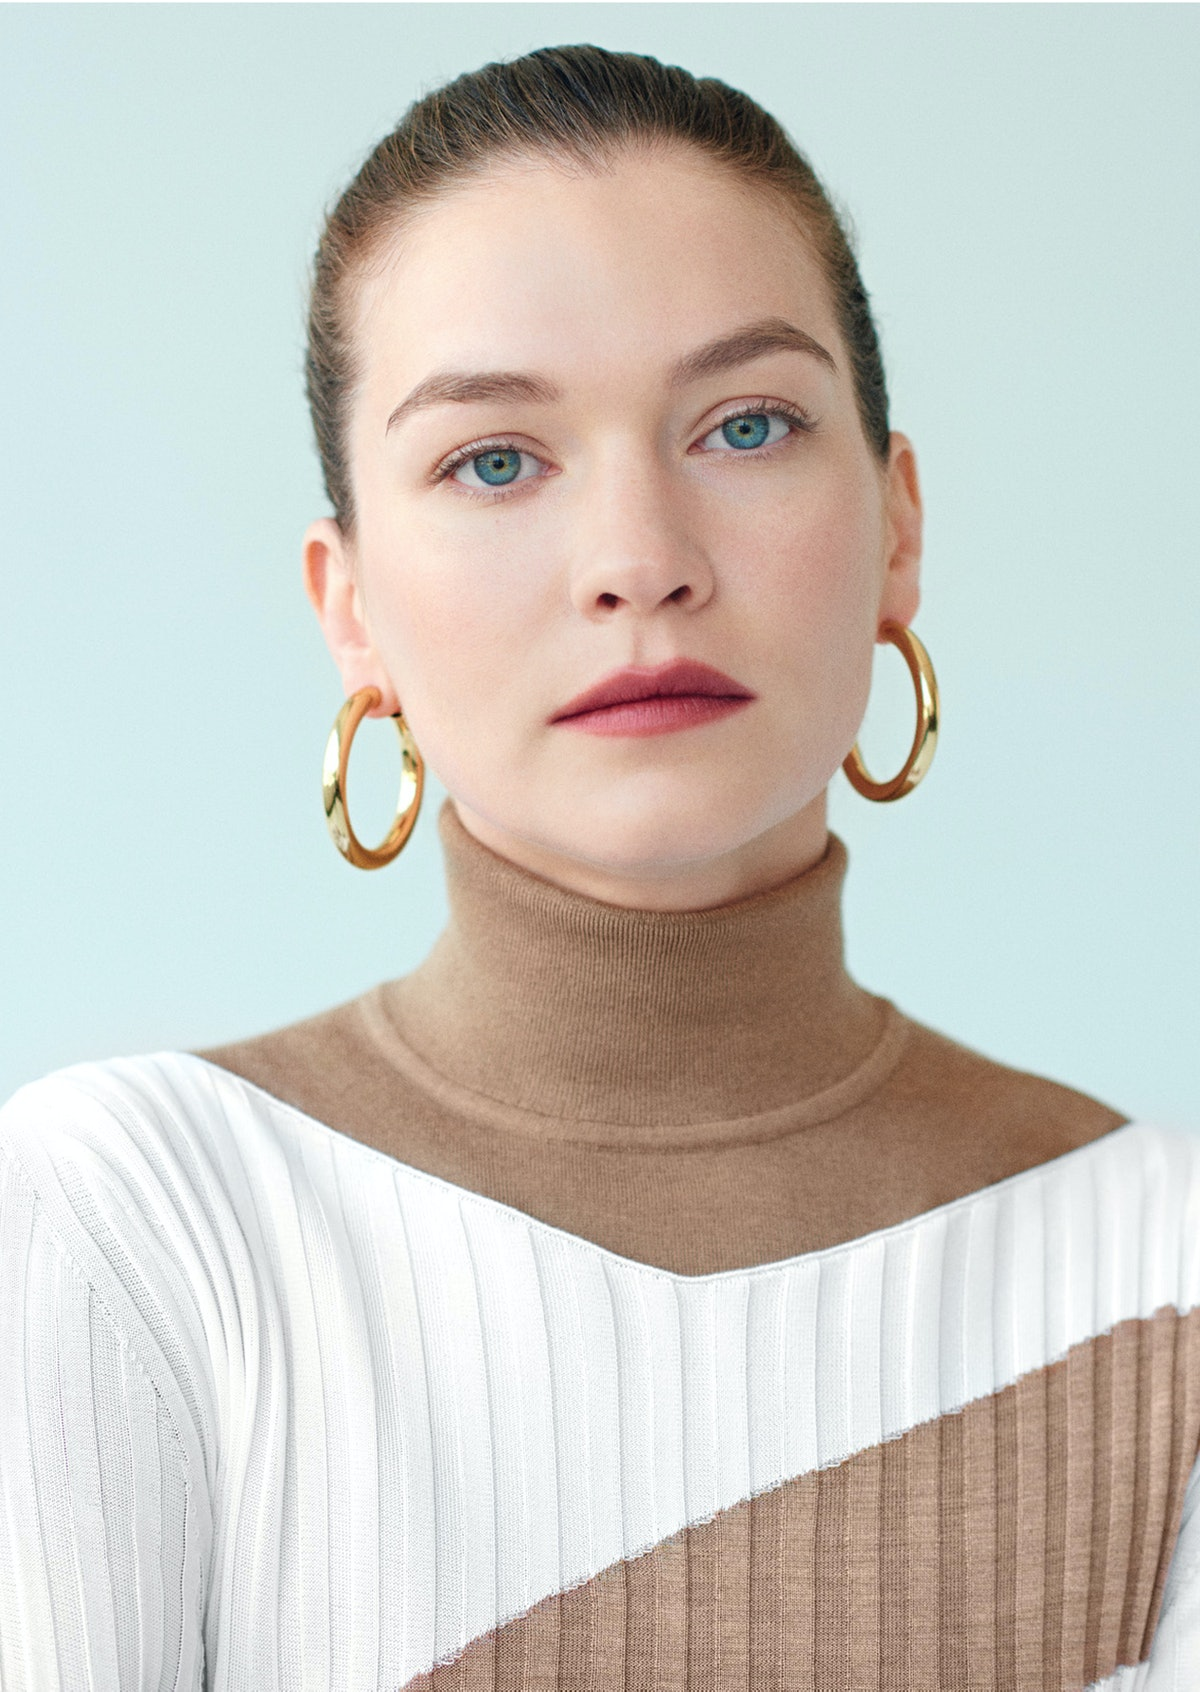 Hanna Gross - October 2017 - Who Opener